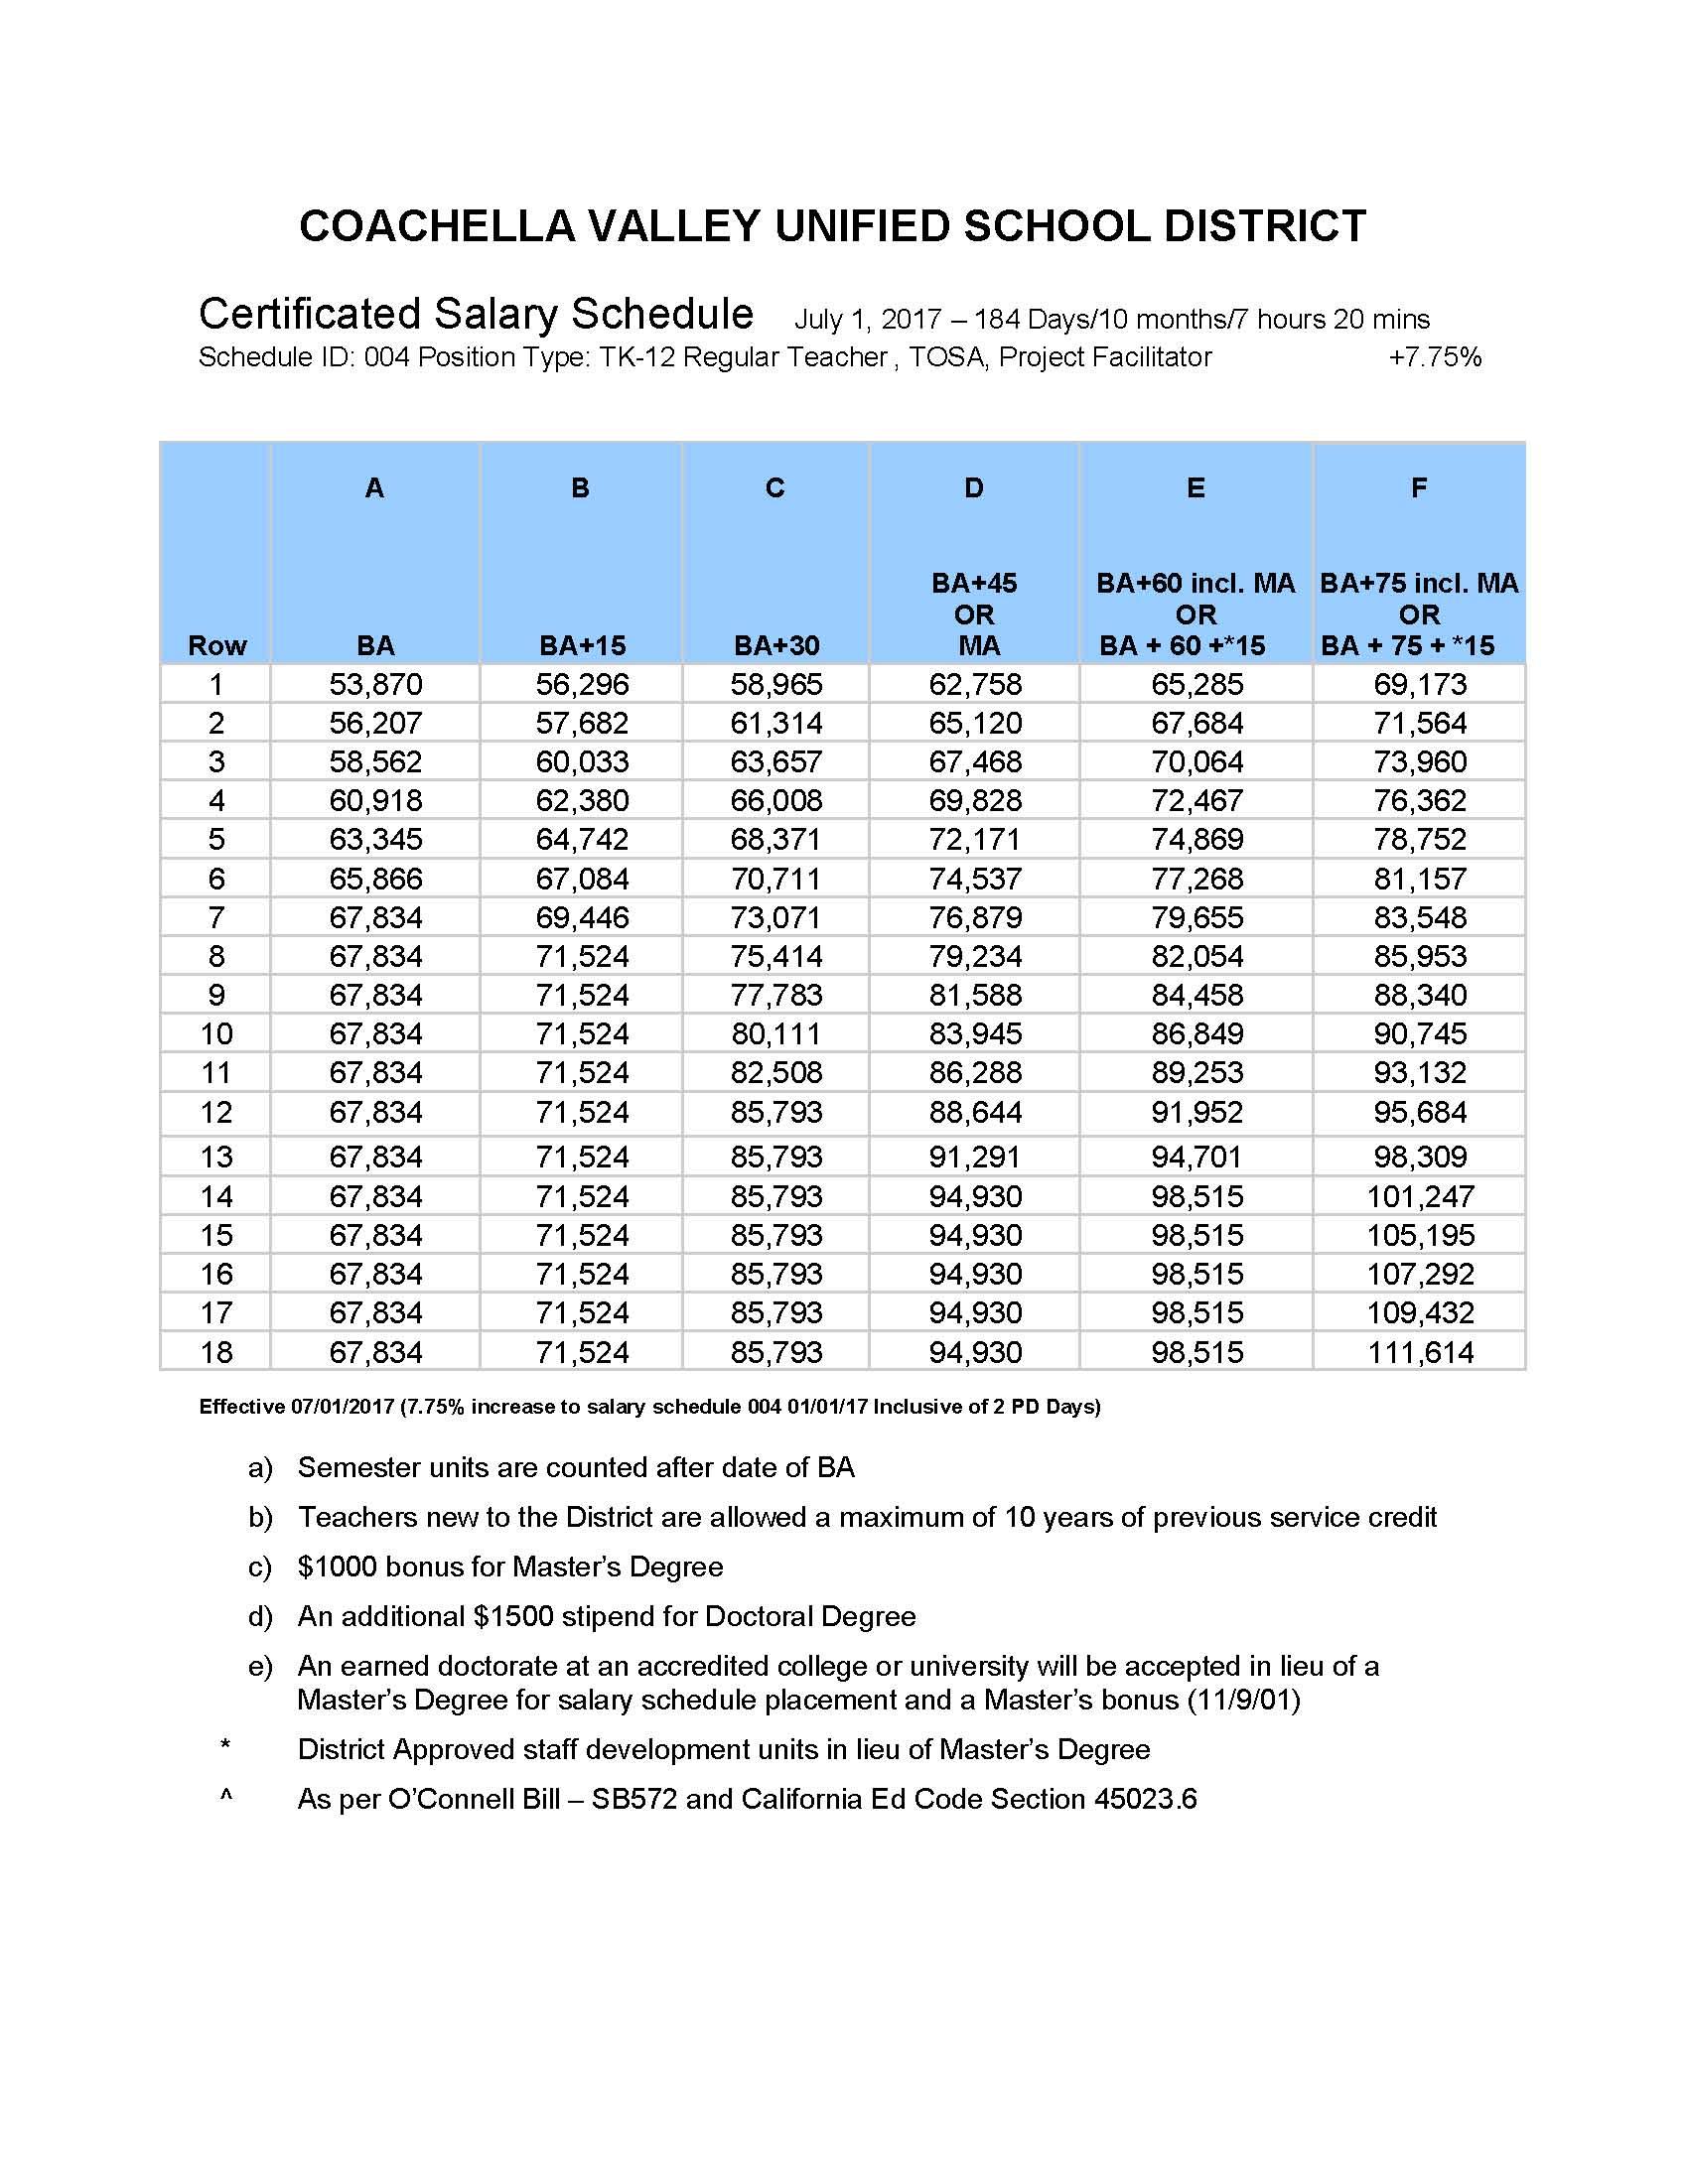 Courseworks Mailman Salary Schedule California Uroxehuba7